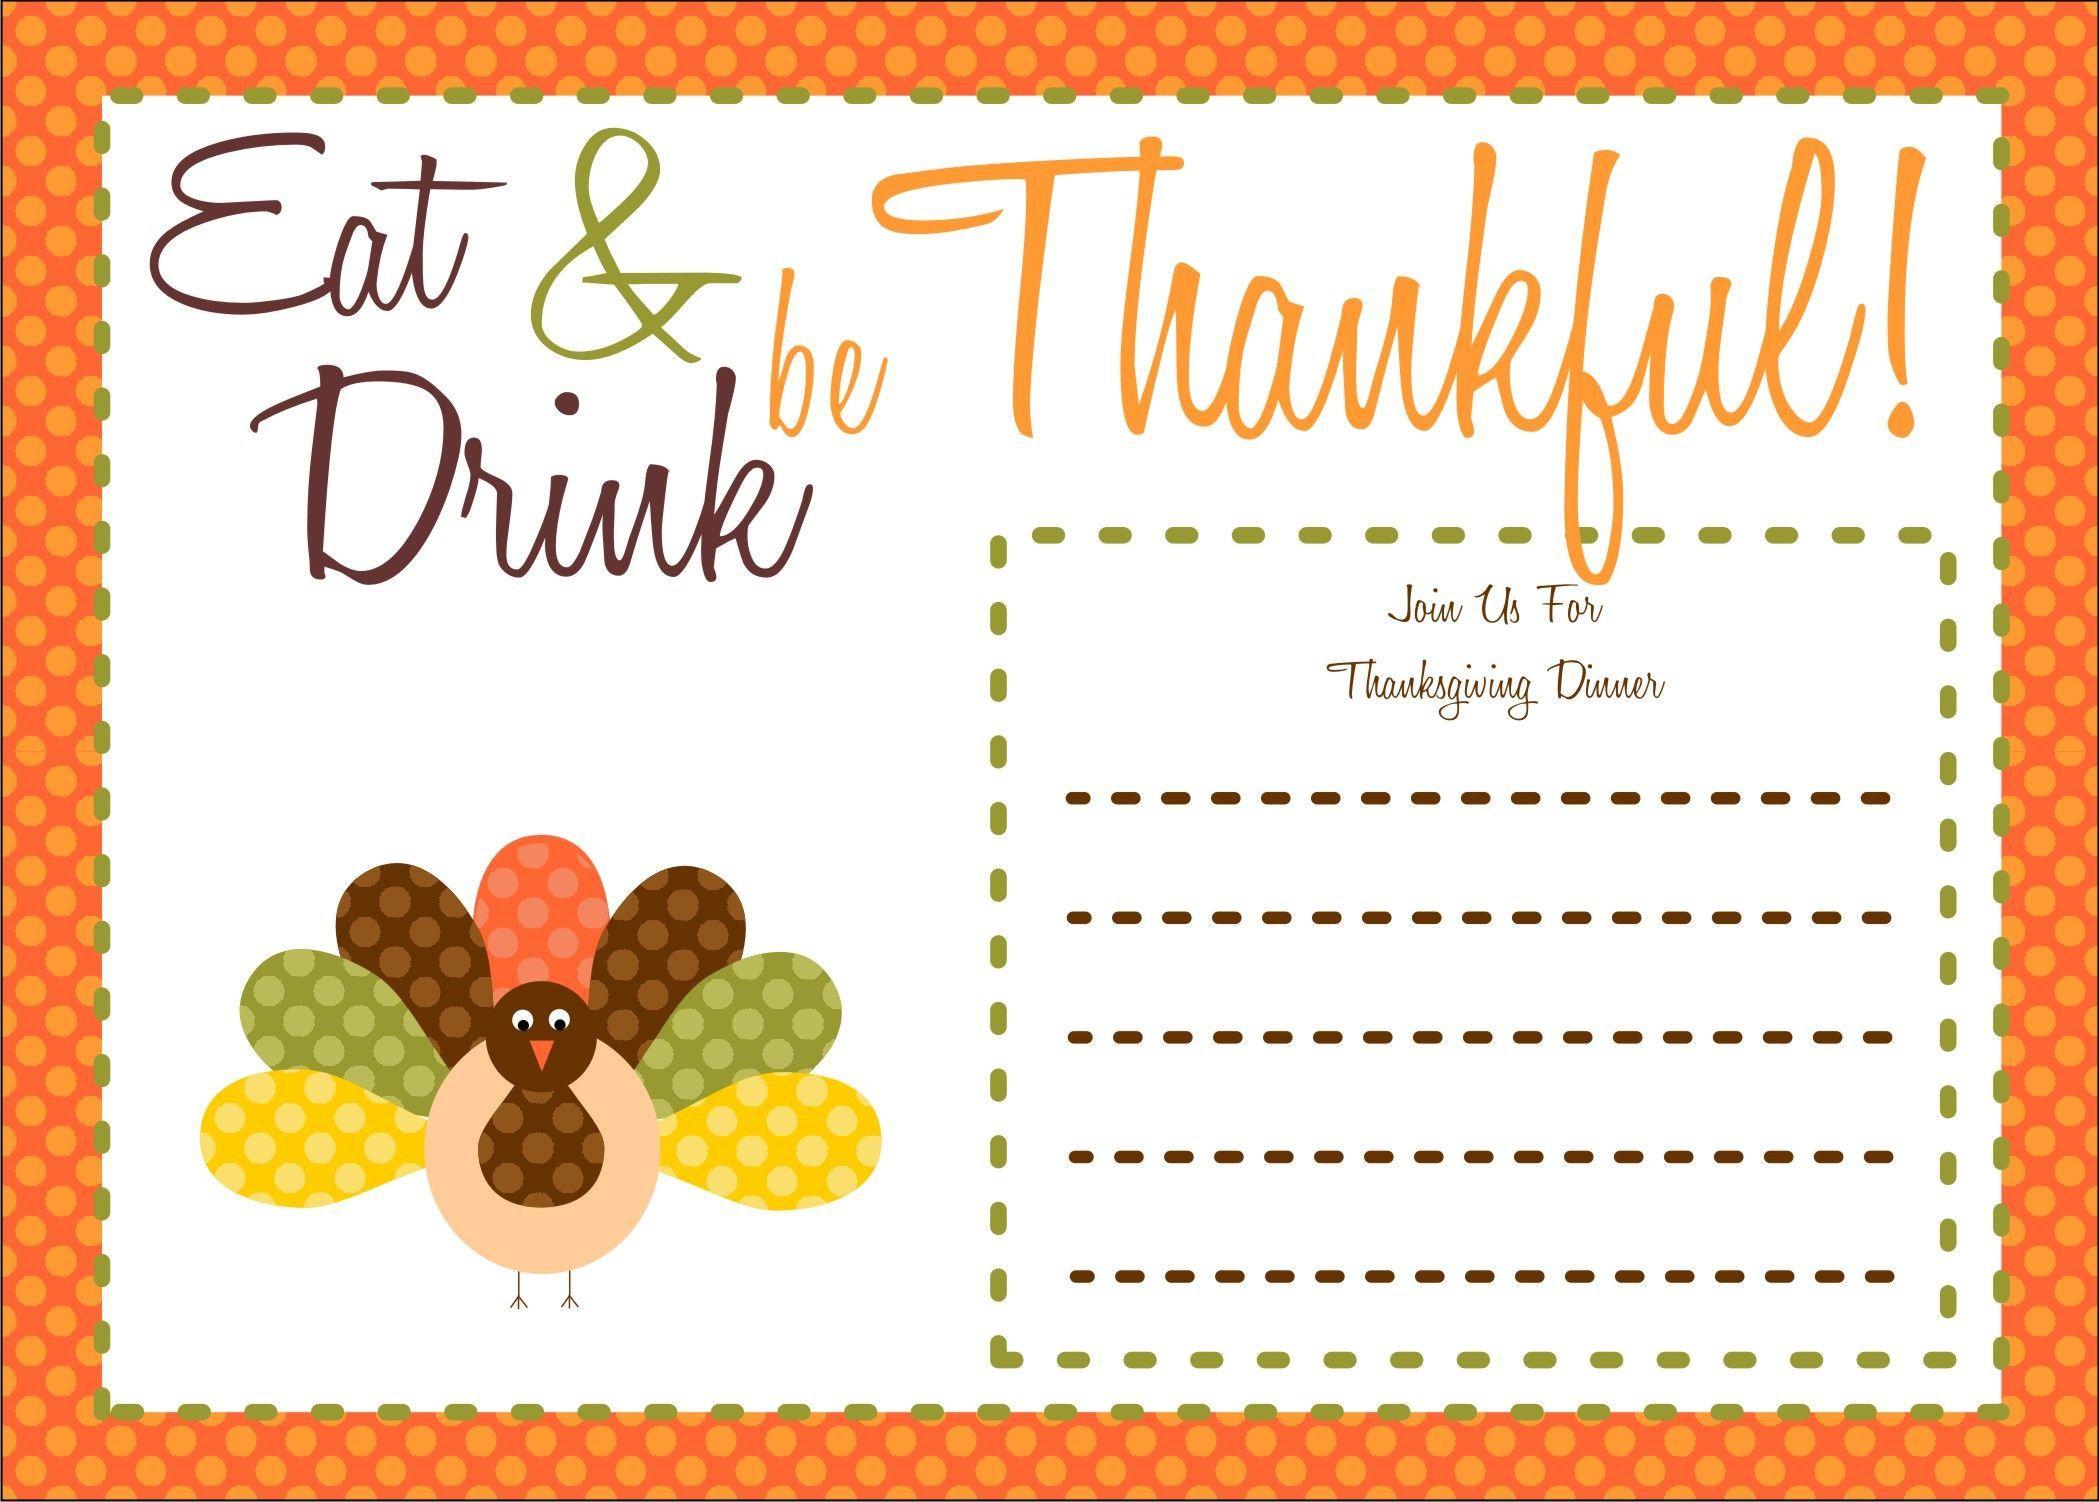 007 Imposing Free Thanksgiving Invitation Template High Def  Templates Printable Dinner Download PotluckFull